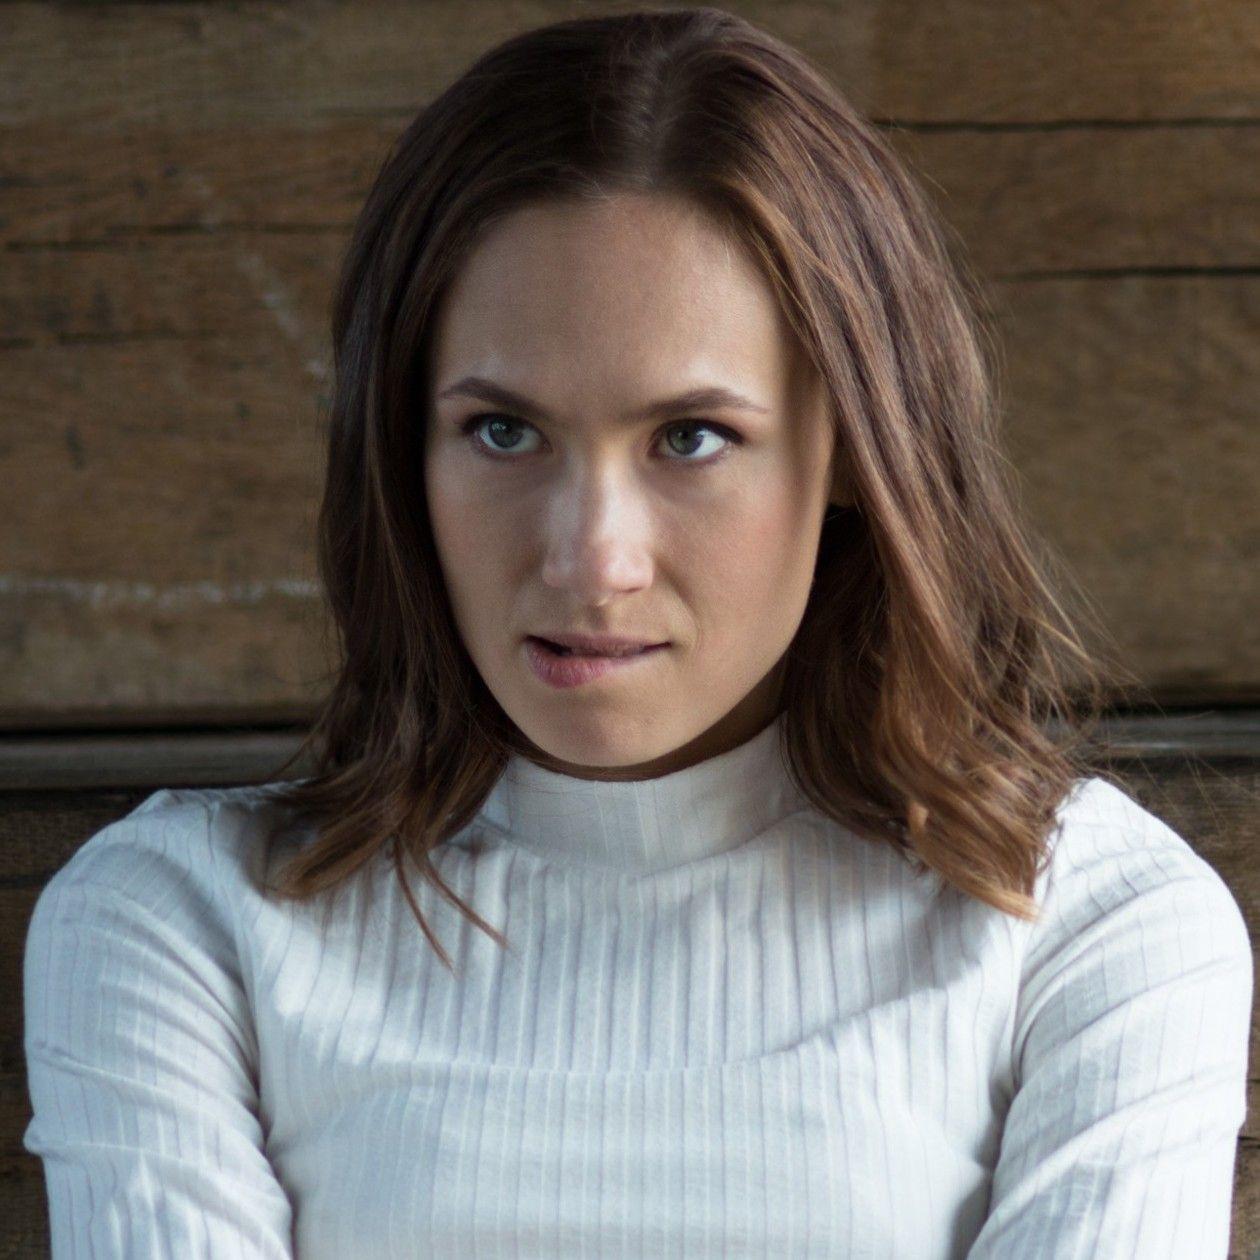 Close-up Alina Levshin actress / photo (c) Nadja Klier 2017 Detail / Gros plan